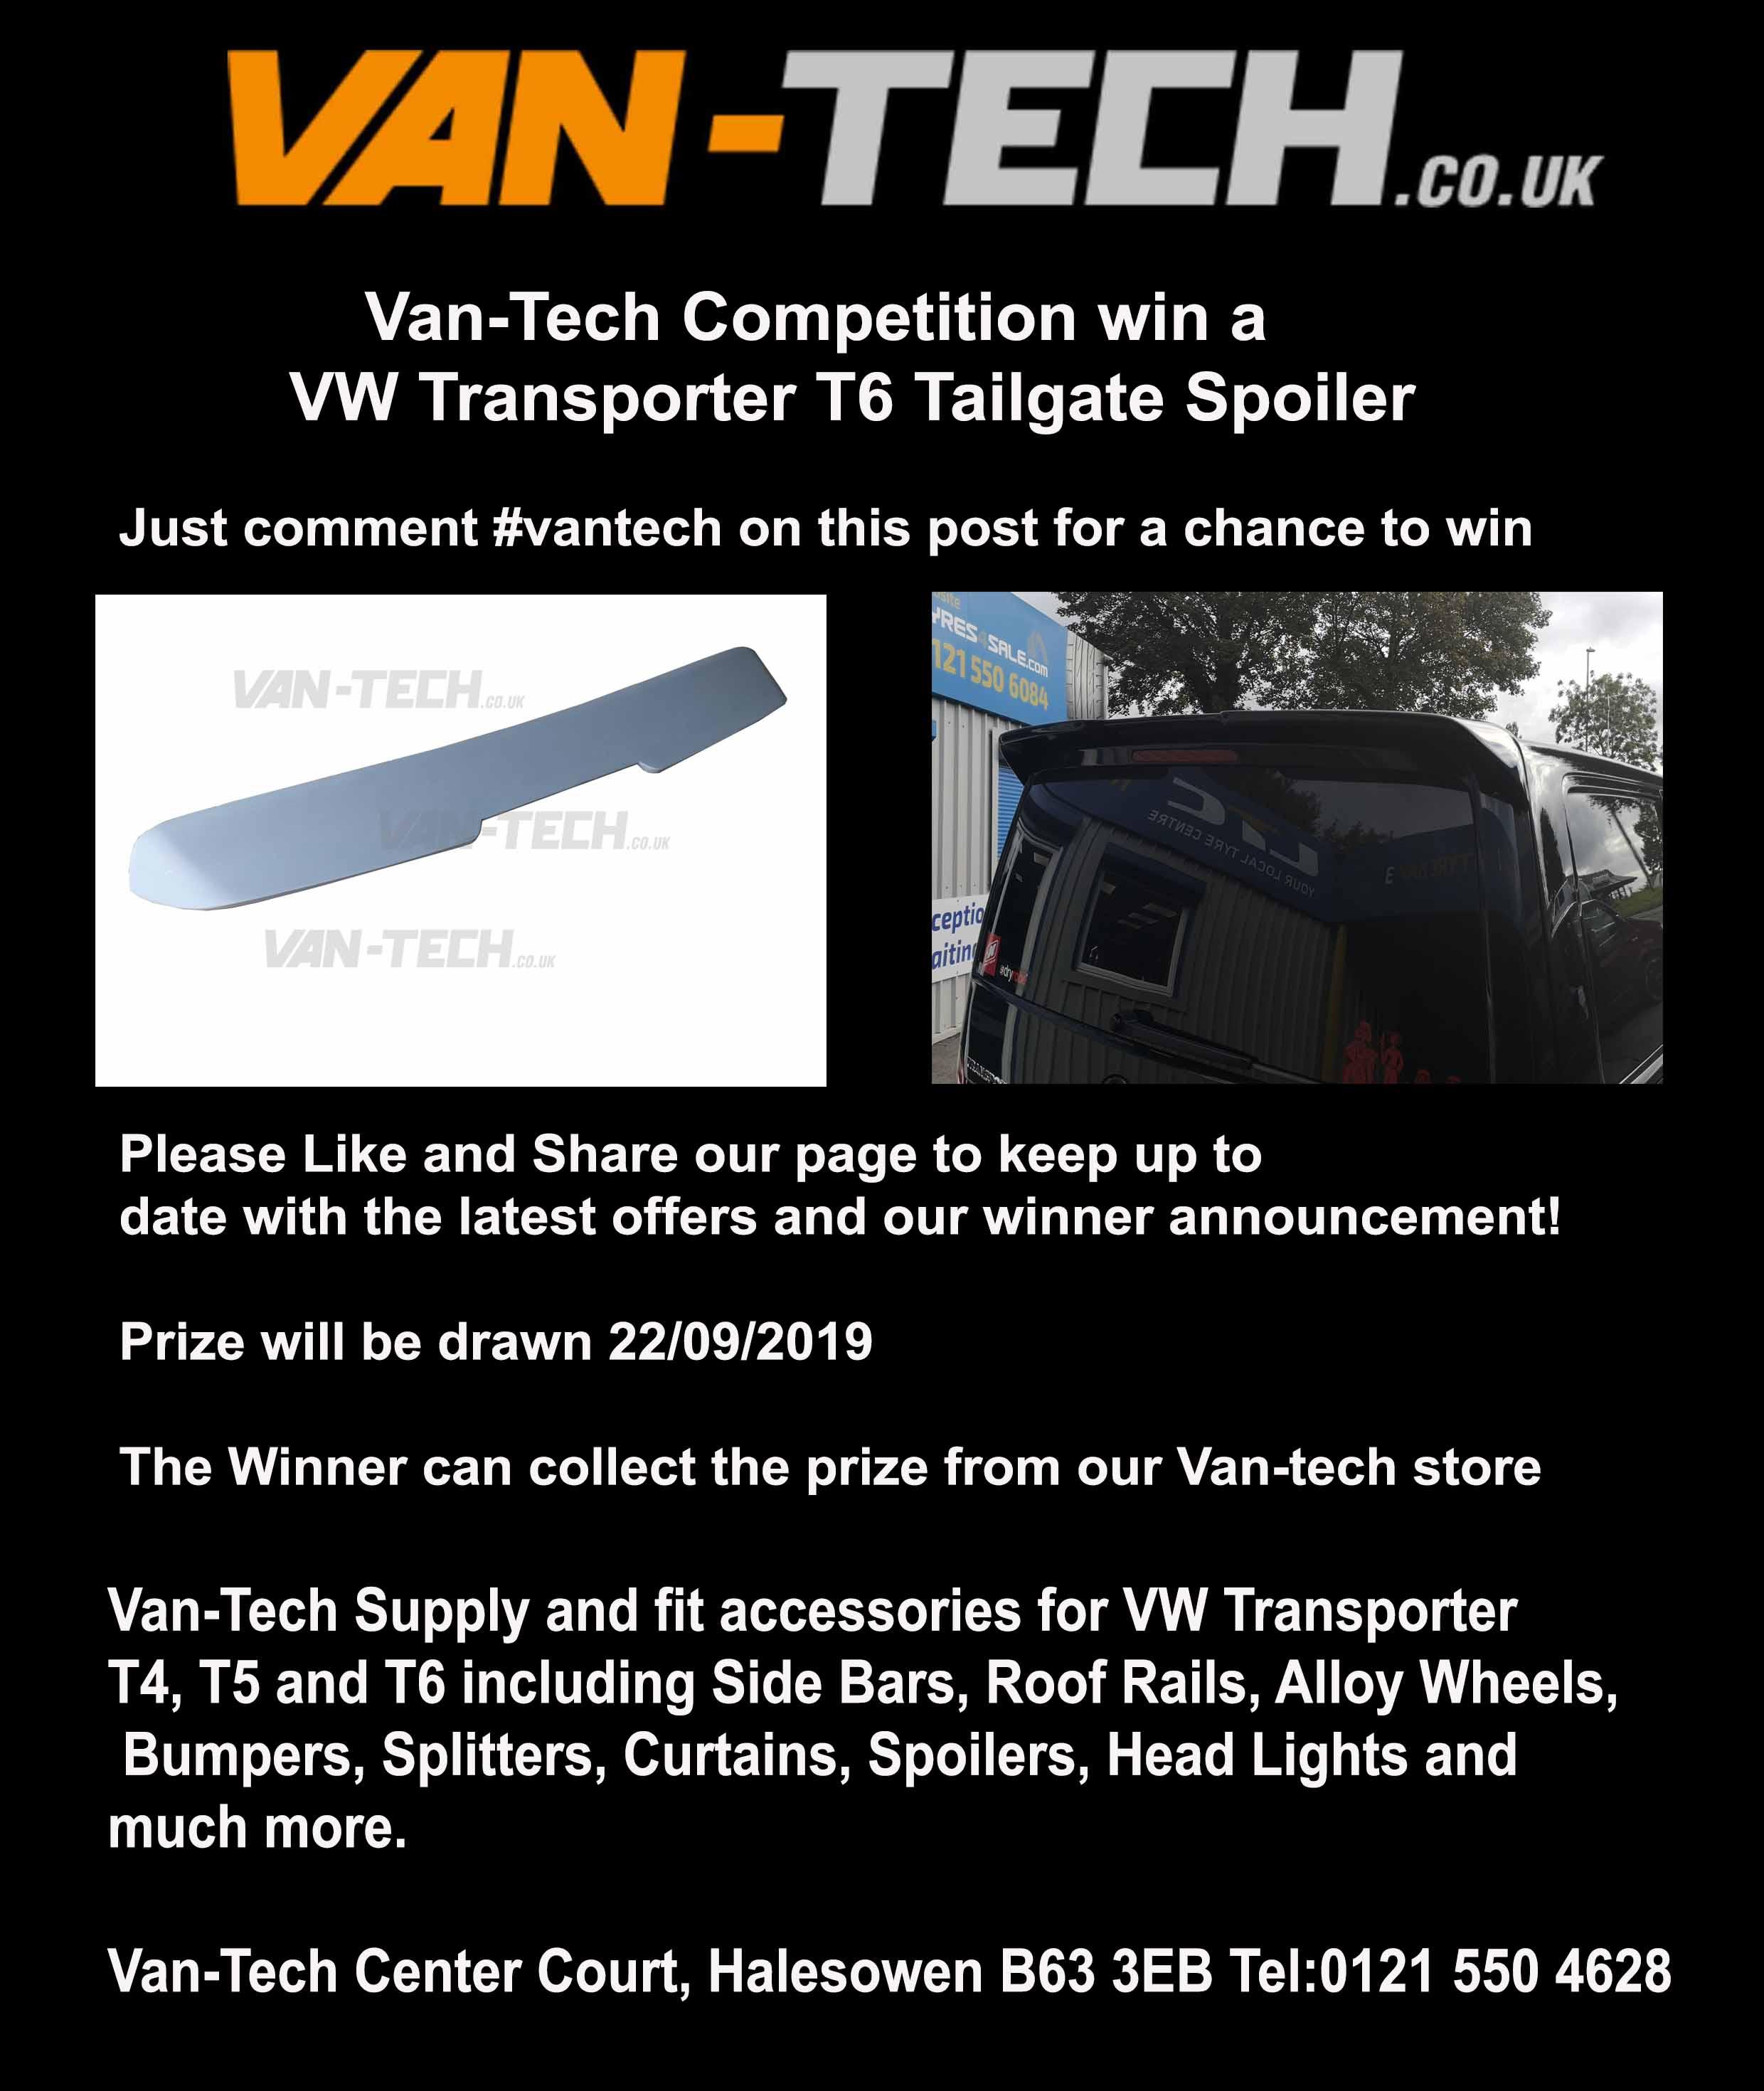 Van-Tech Competition win